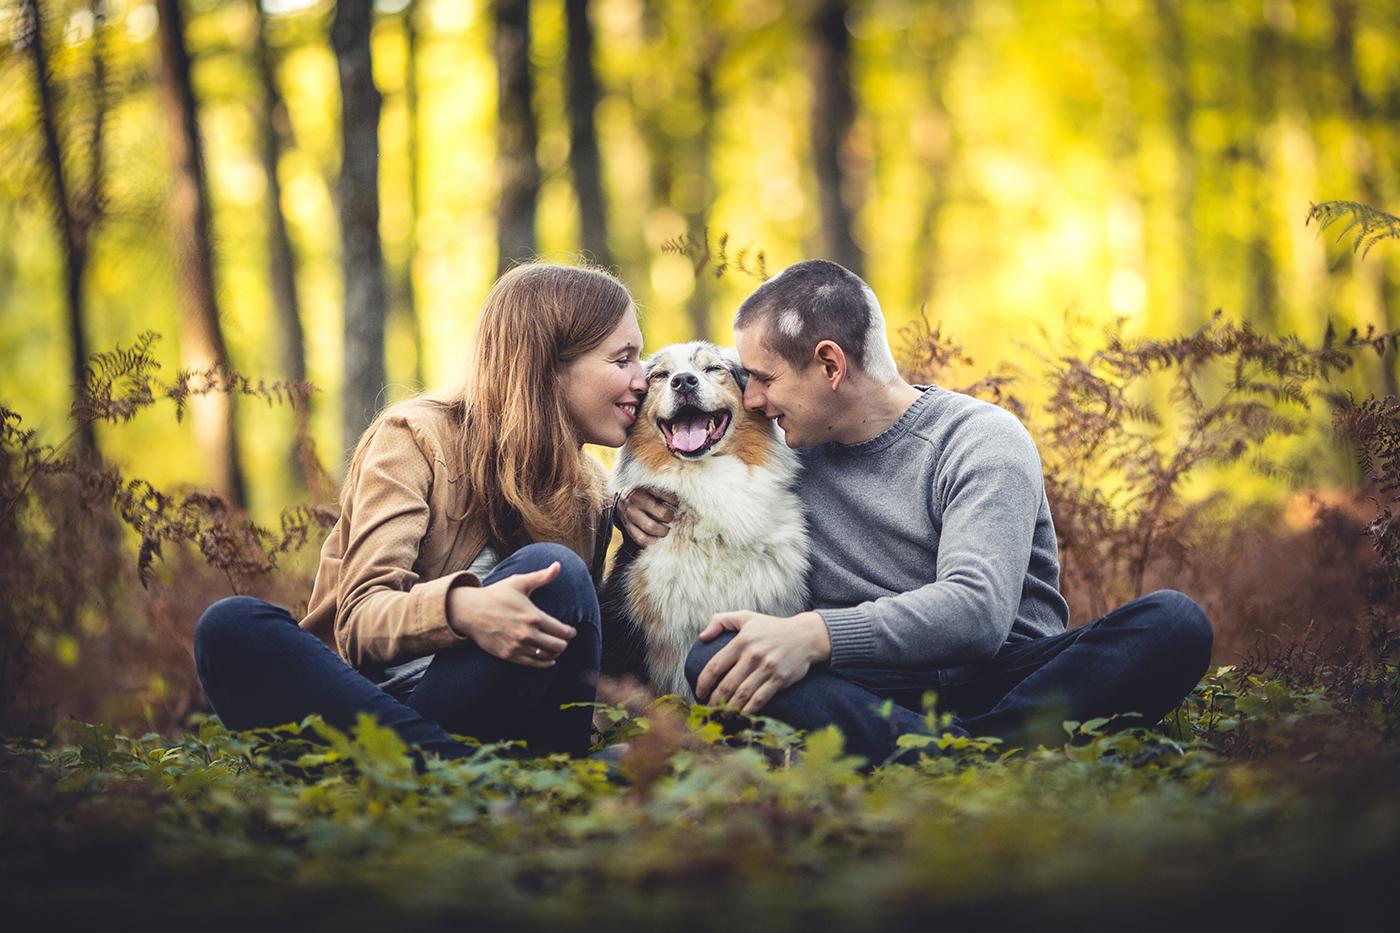 photographe-animalier-chien-canin-poitiers-guillaume-heraud-06